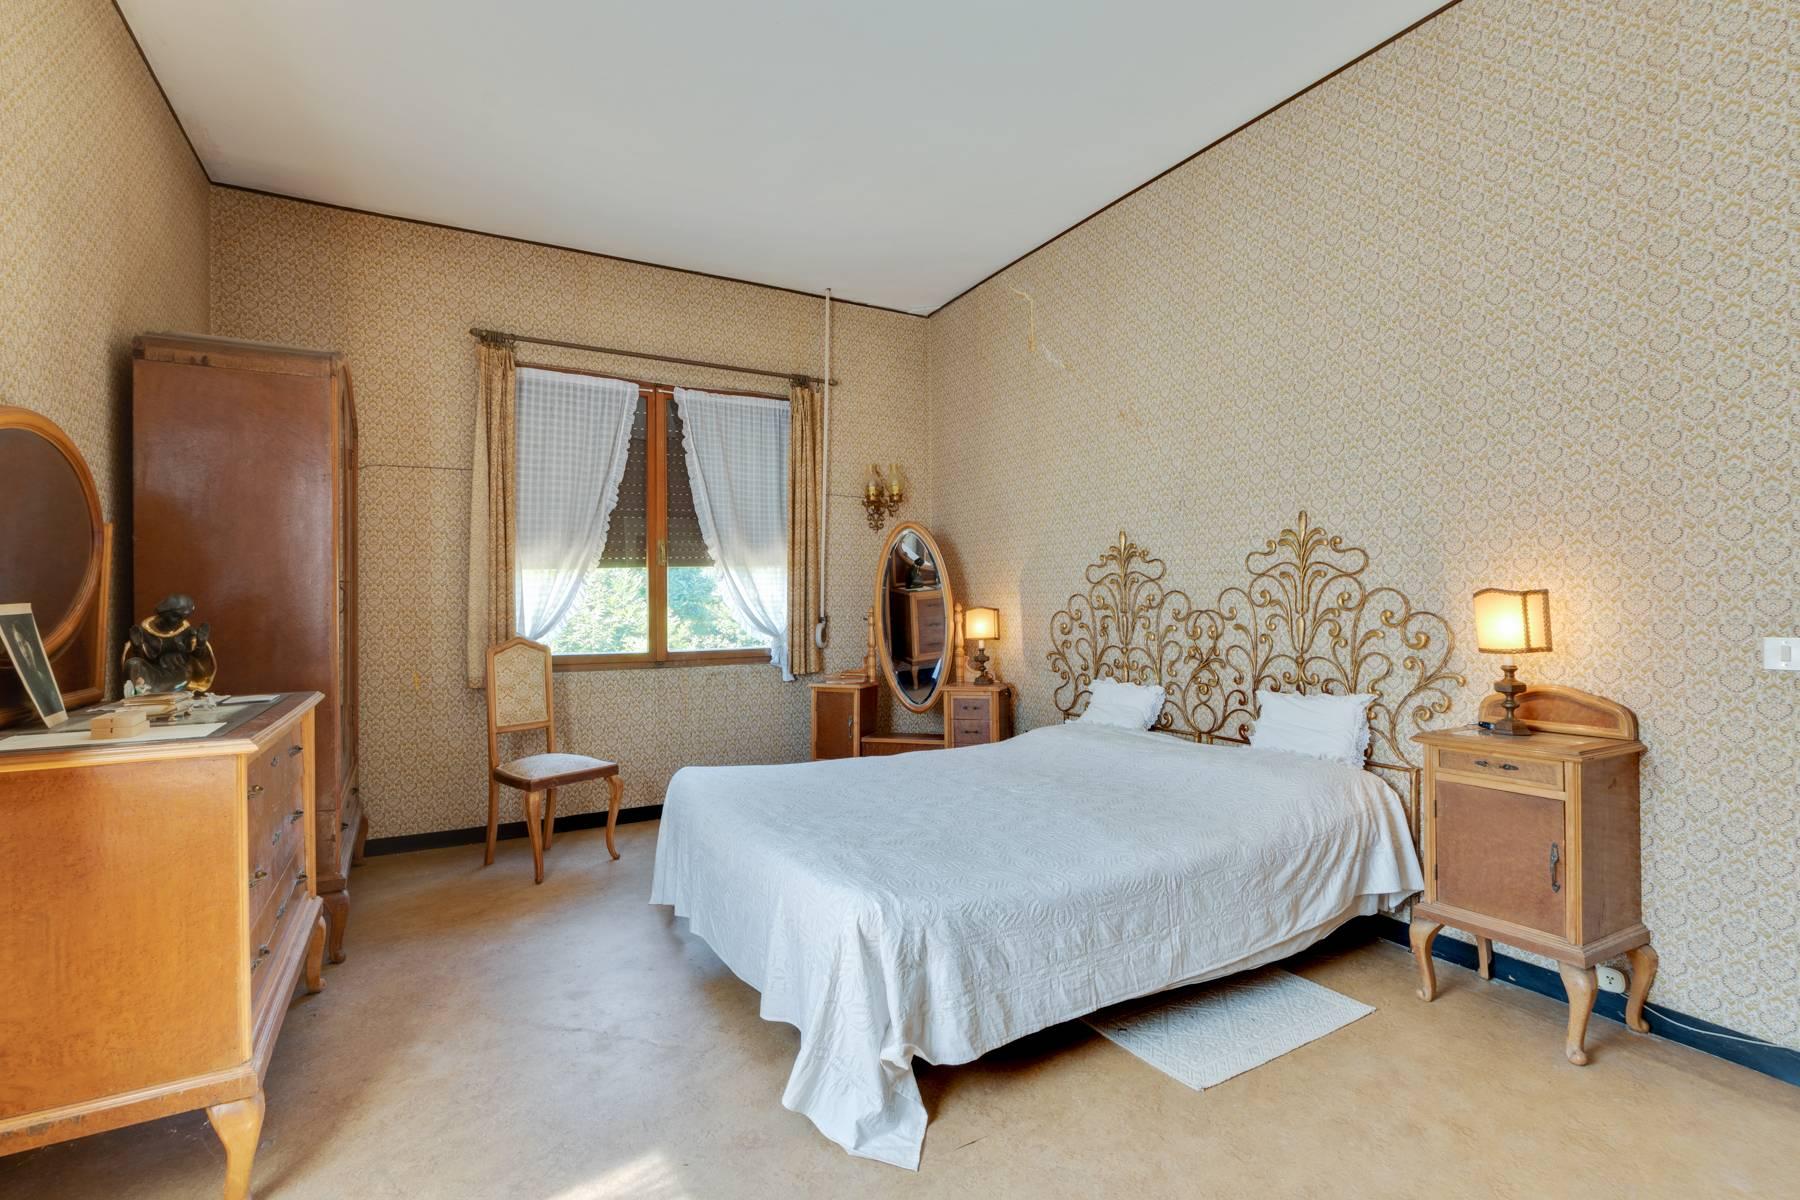 Villa in Vendita a Stresa: 5 locali, 150 mq - Foto 15